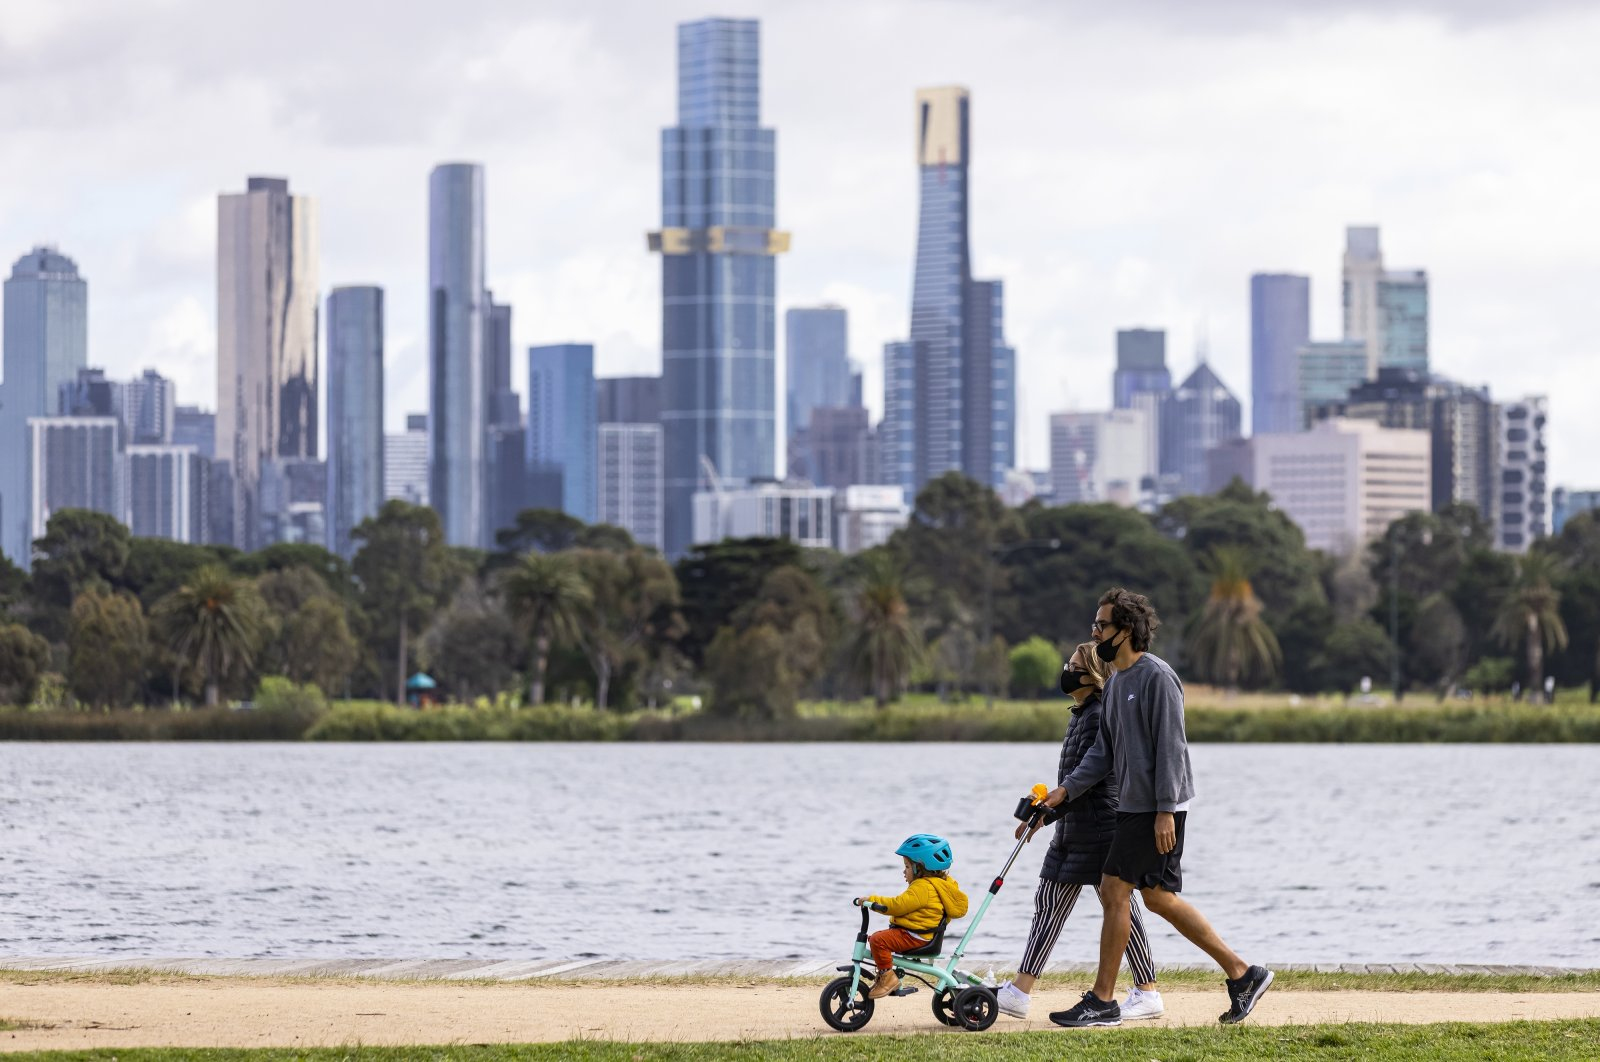 People exercise at Albert Park Lake in Melbourne, Victoria, Australia, Oct. 4, 2021. (EPA Photo)